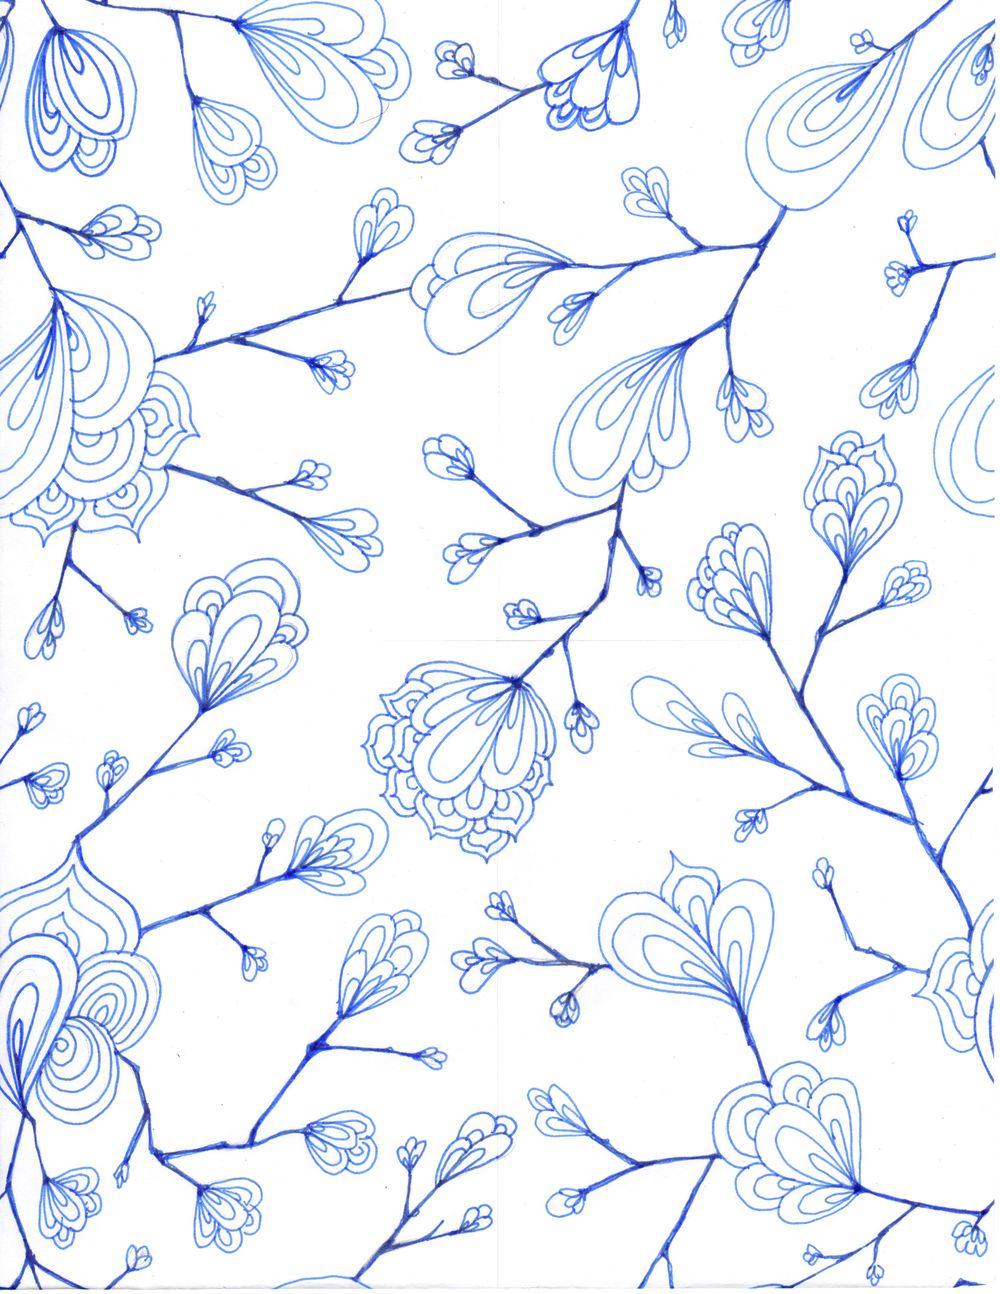 pen flowers - image 1 - student project